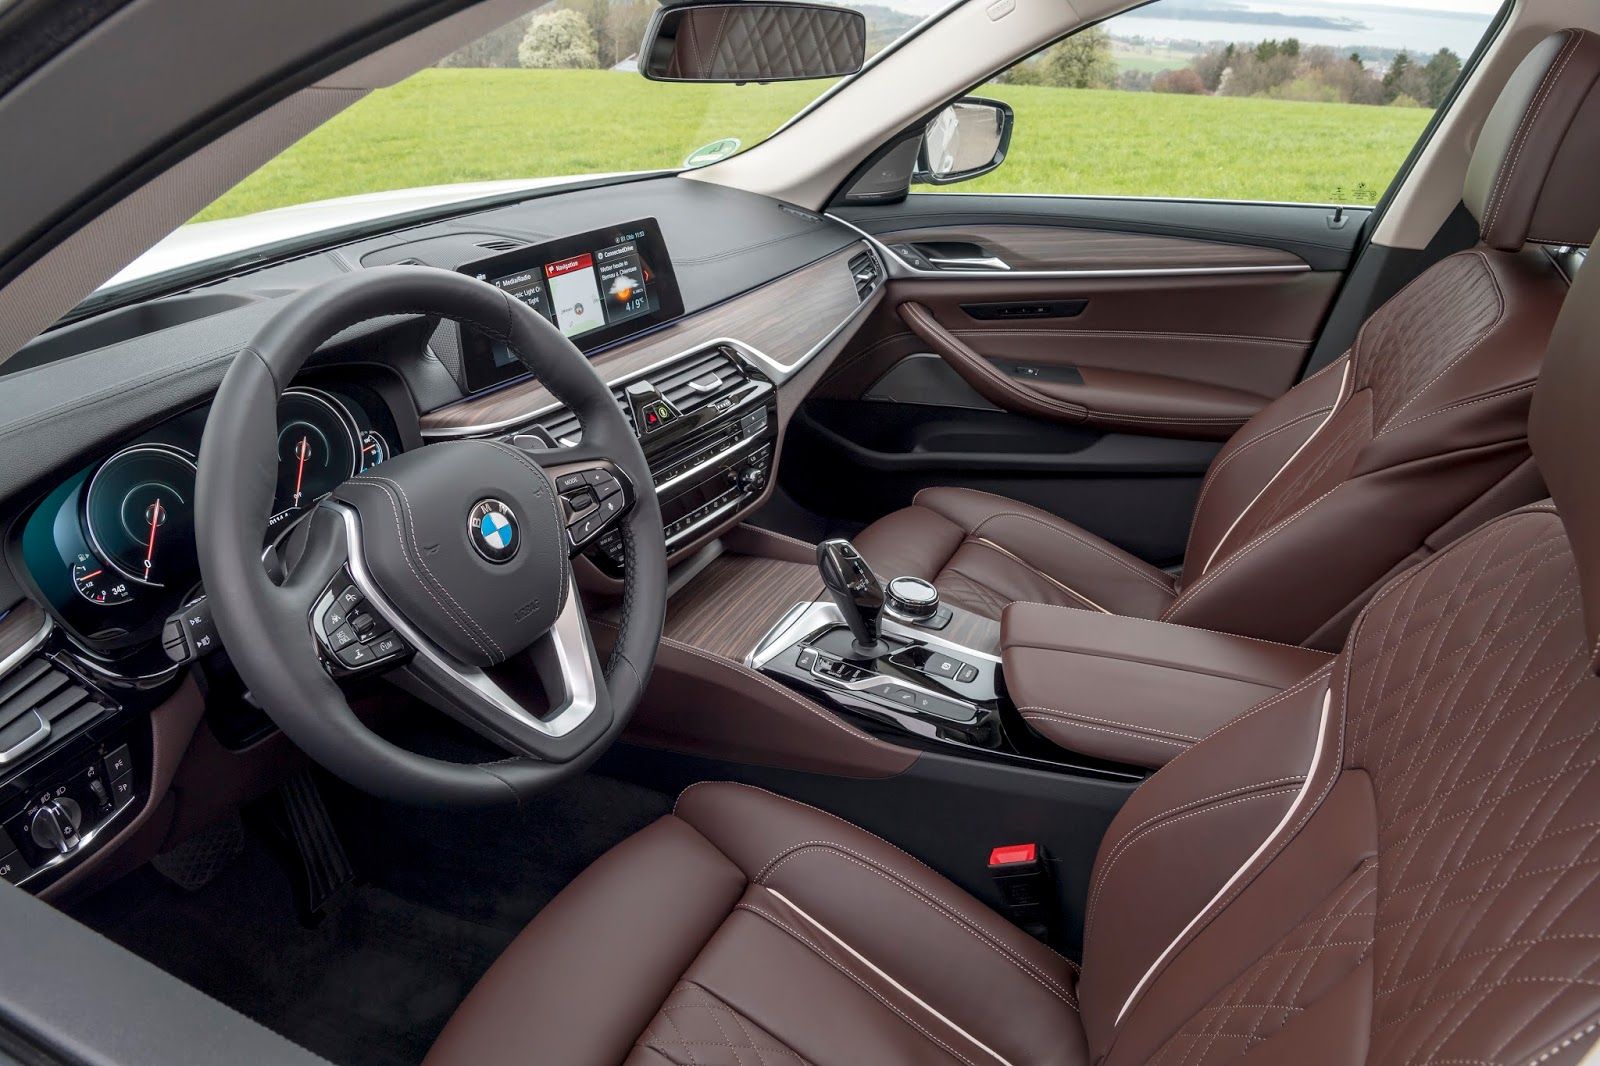 P90256384 highRes the new bmw 530e ipe Η BMW 530e iPerformance φέρνει την ηλεκτρική επανάσταση BMW, BMW 5, BMW 530e iPerformance, Electric cars, Hybrid, Λανσάρισμα